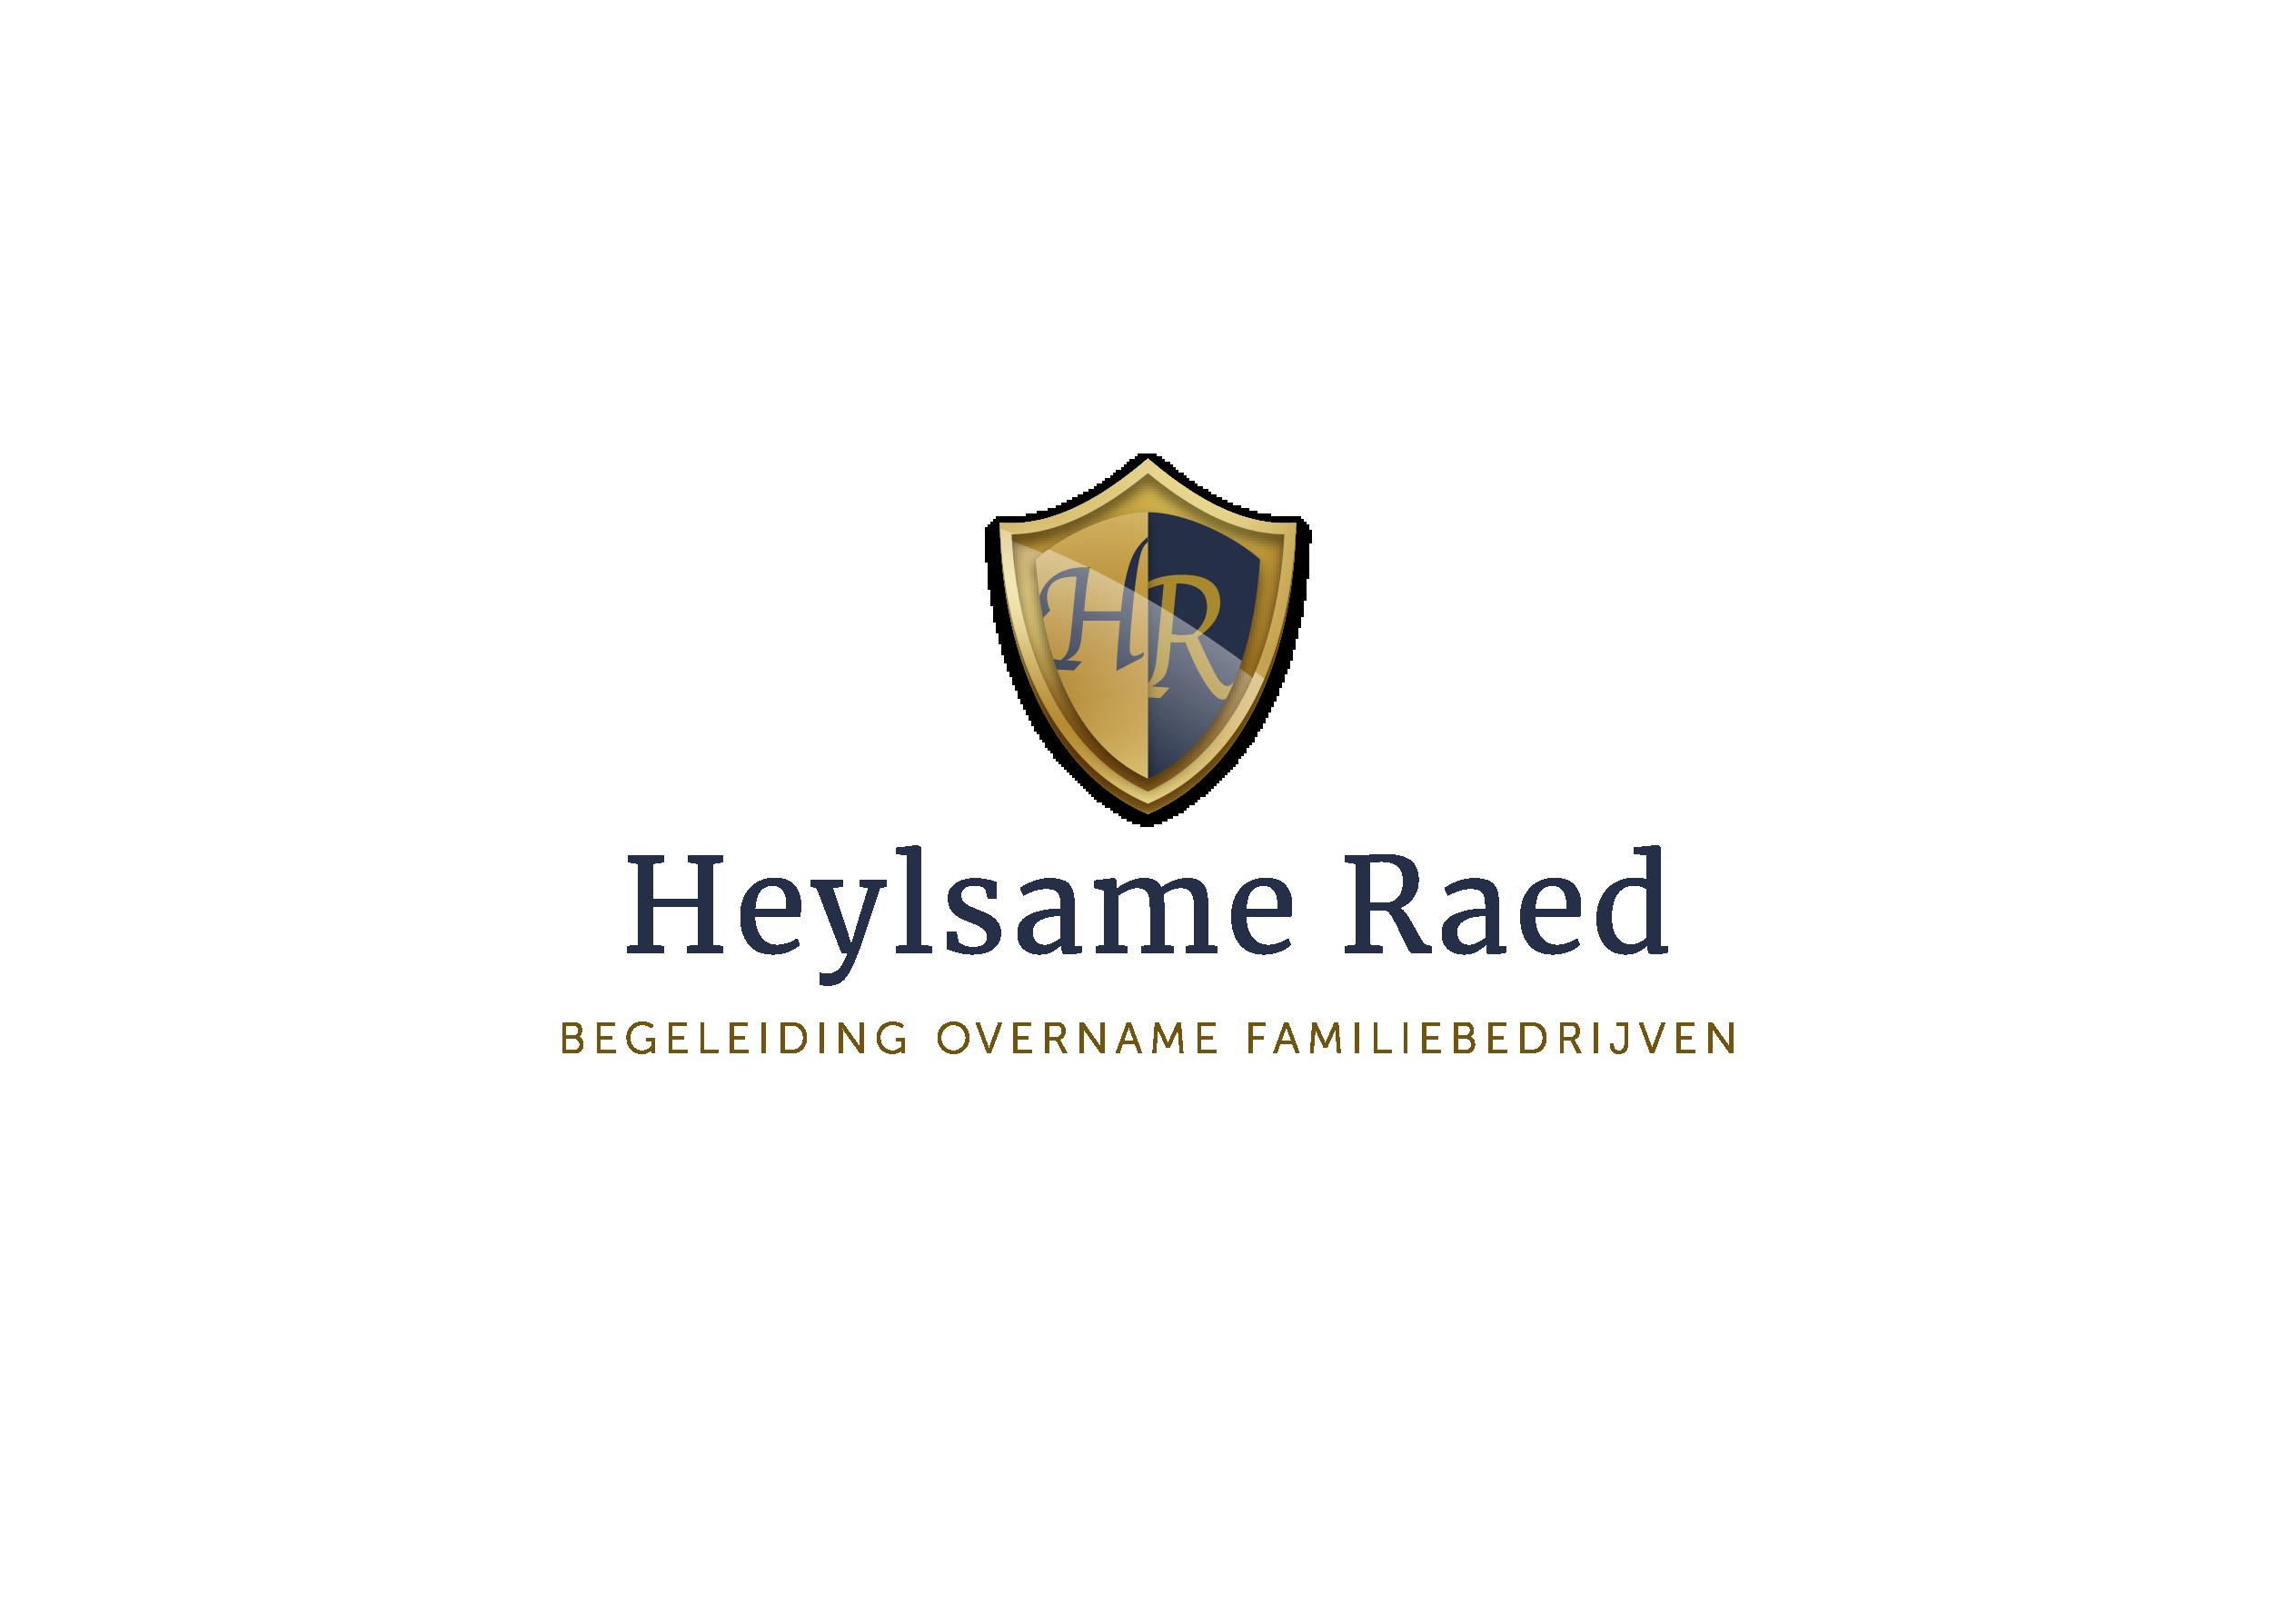 familiebedrijf-overname-adviseur-heylsameraed-logo-payoff-3x